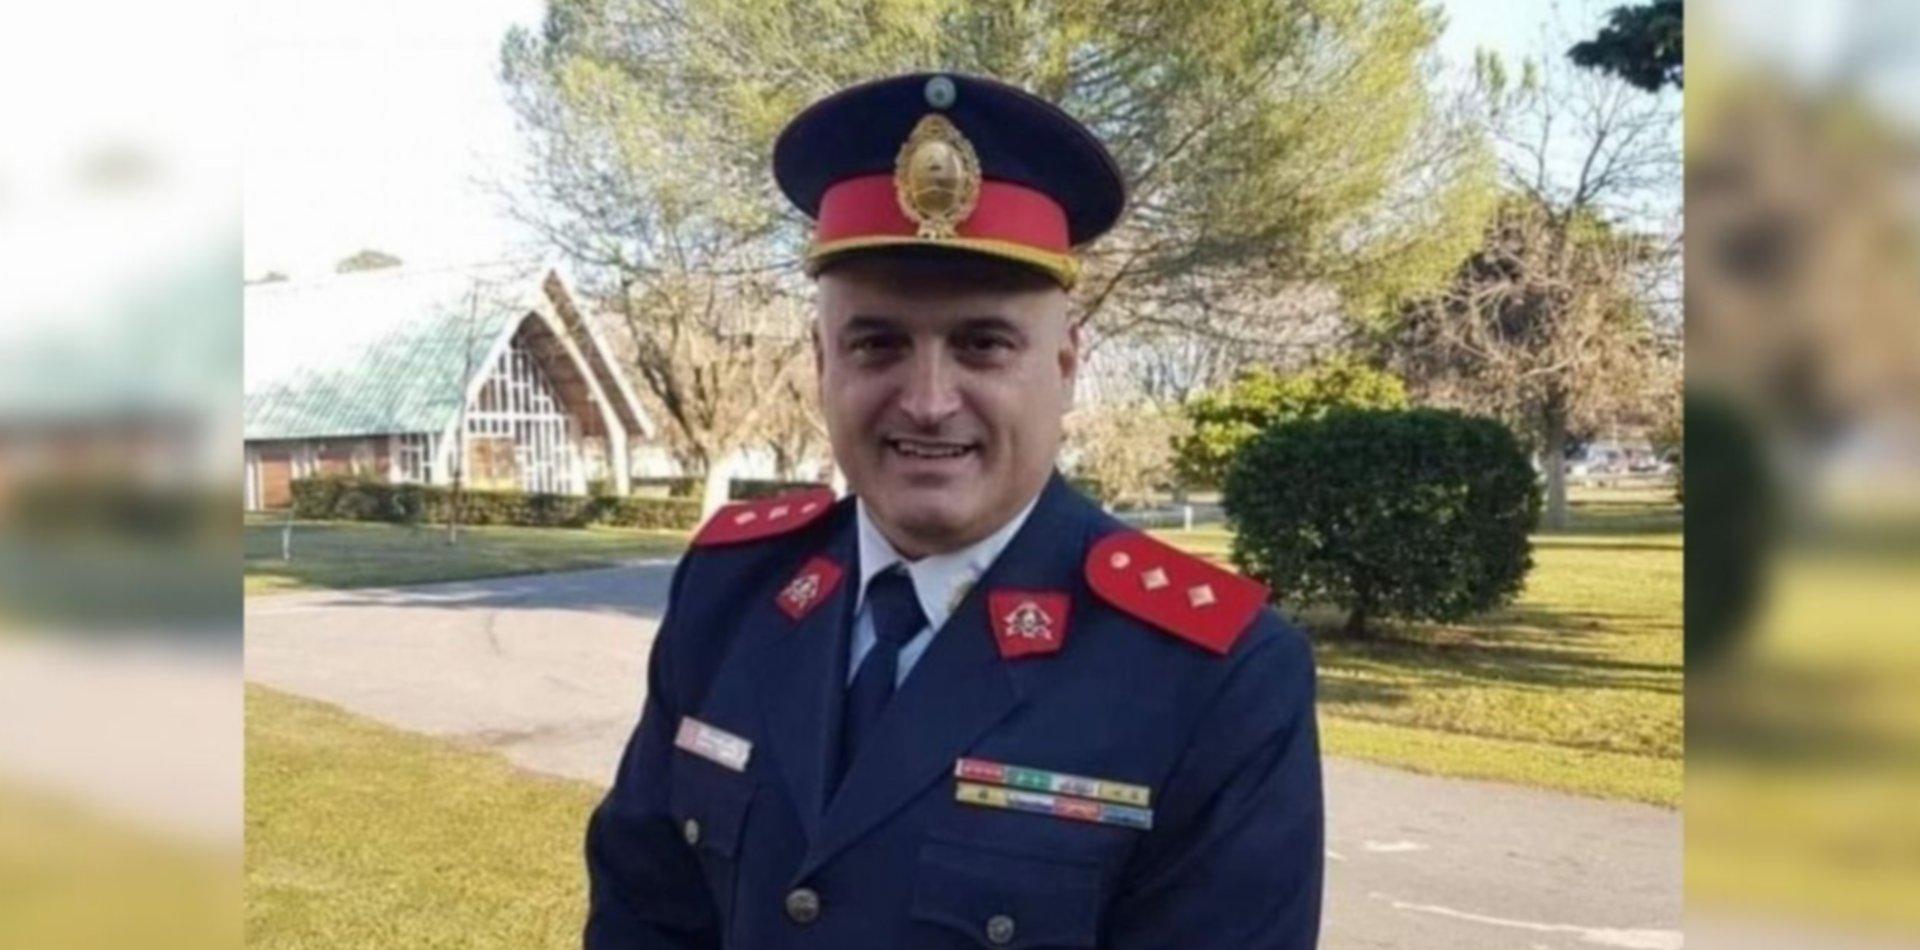 Un bombero de Berisso murió tras una intensa lucha contra el coronavirus